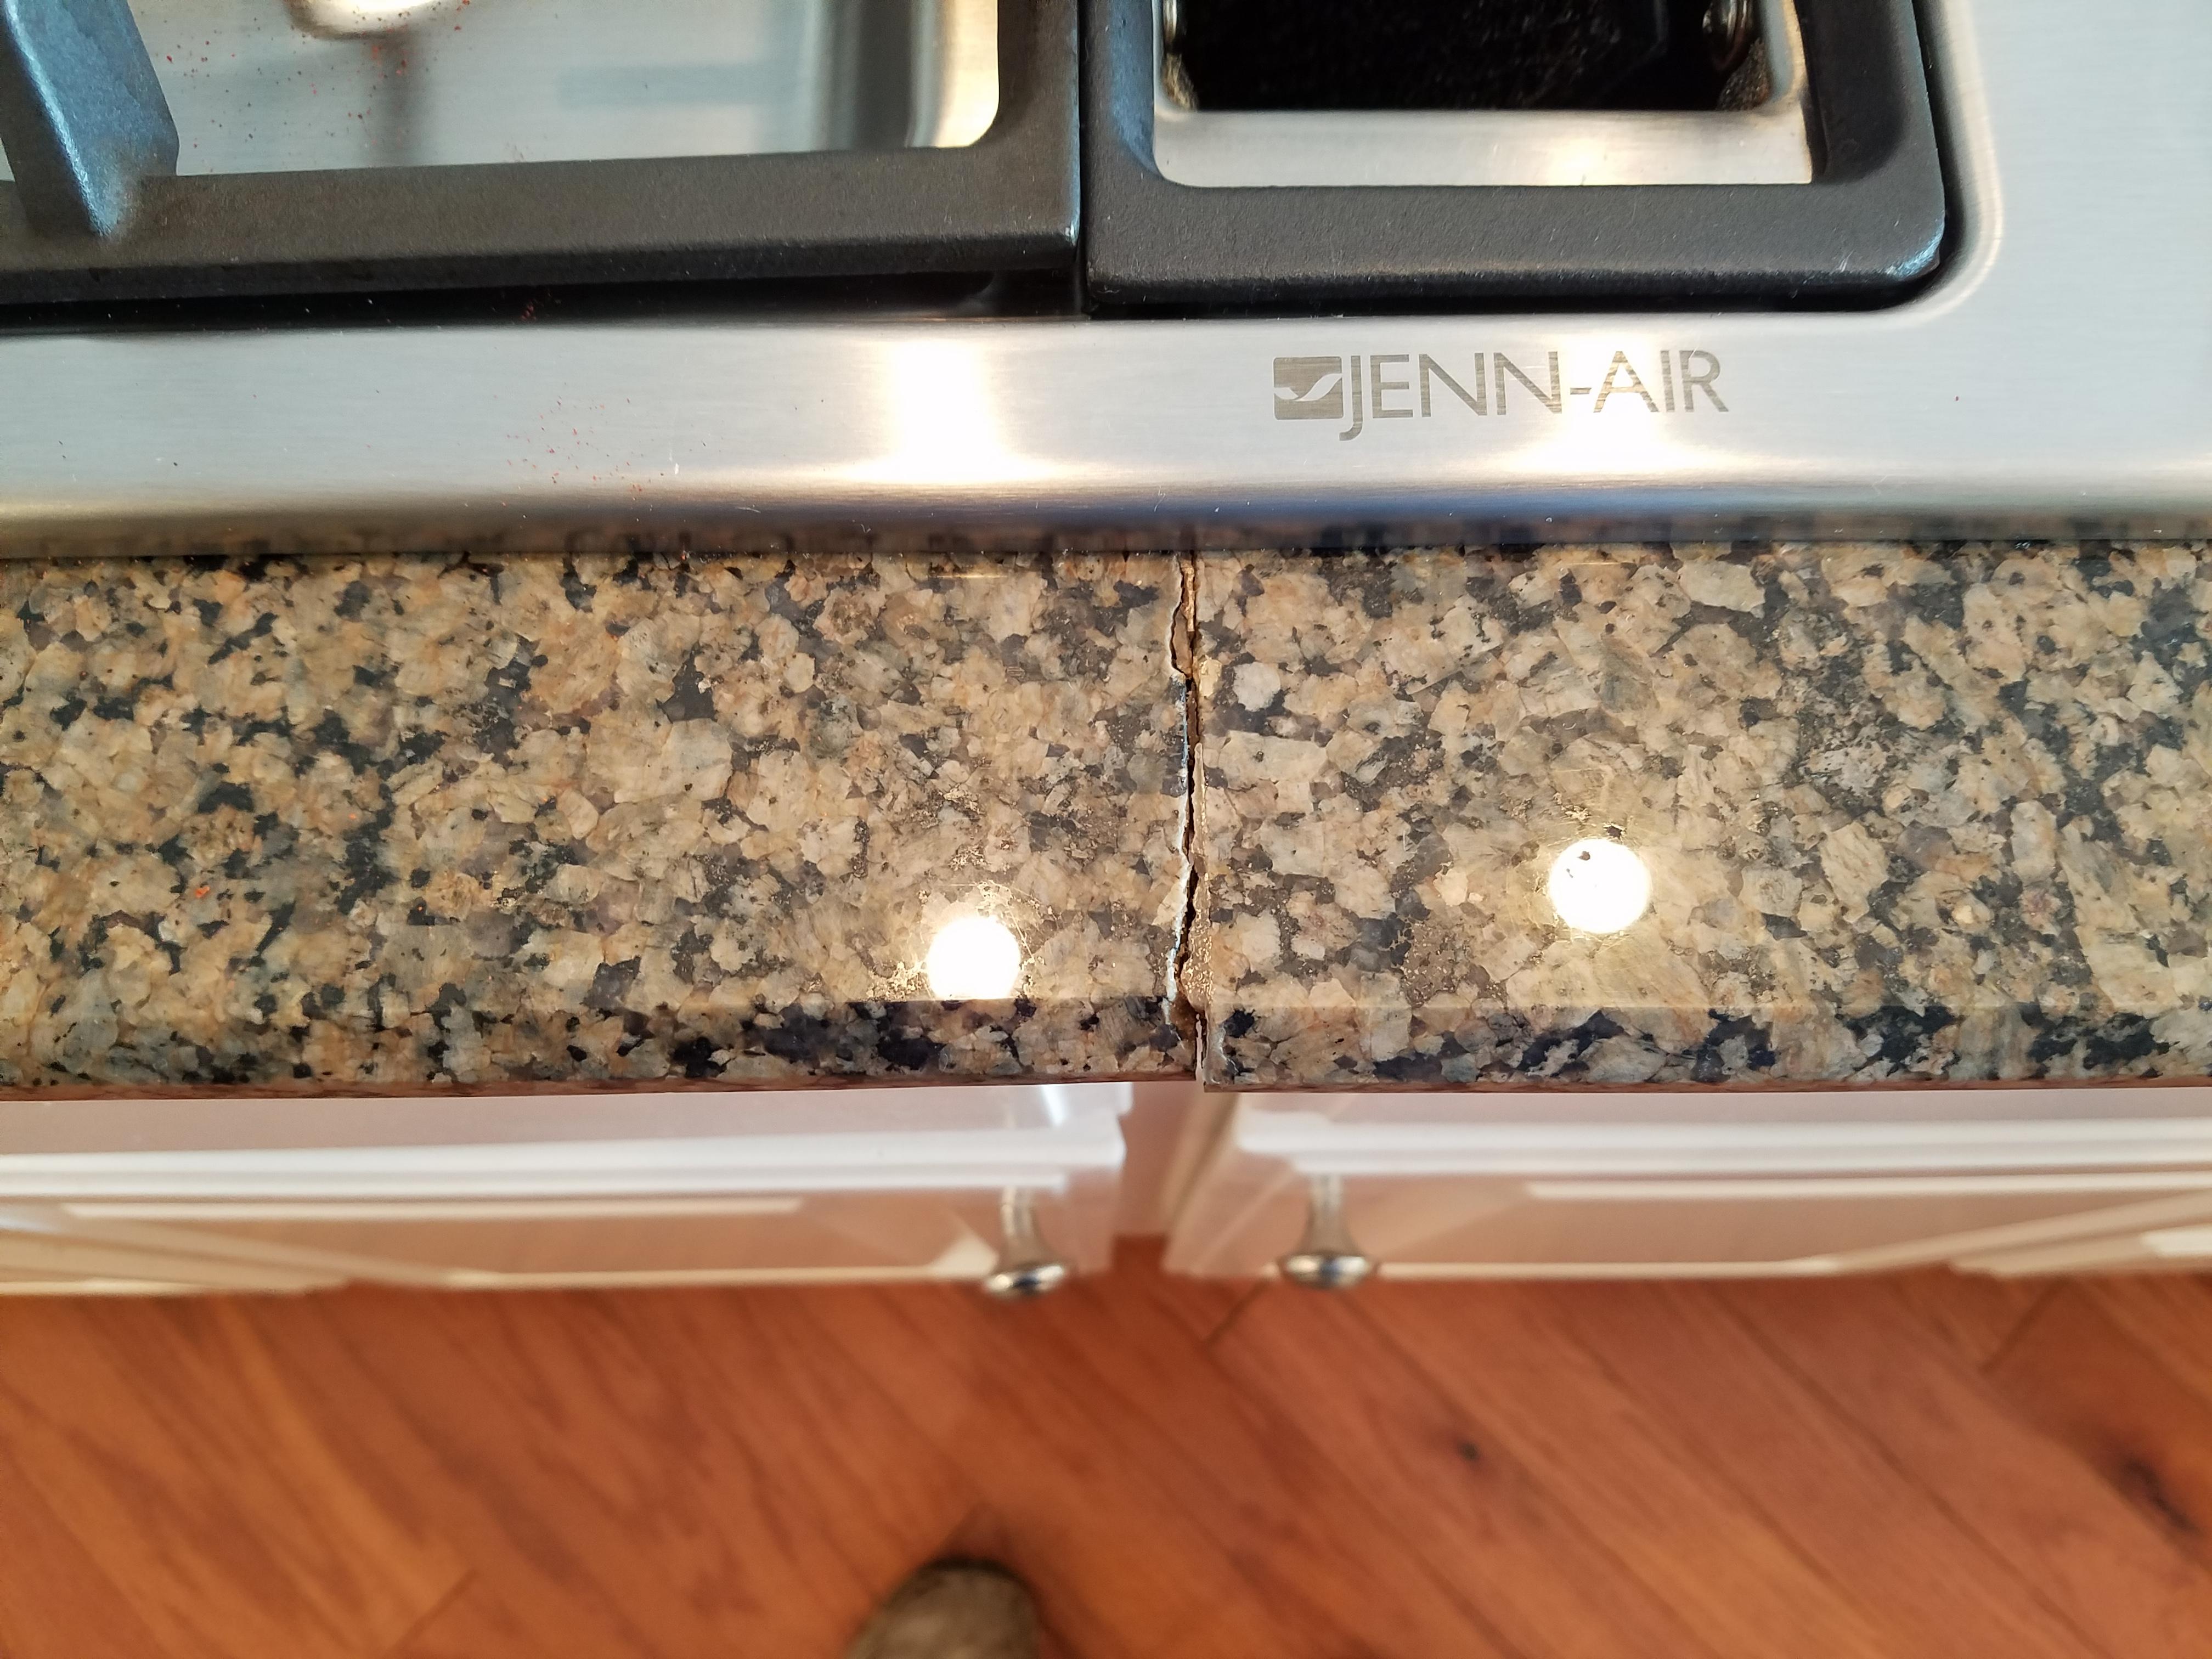 granite countertops new emerald got white floor hardwood the seal pin pearl installed cabinets dark